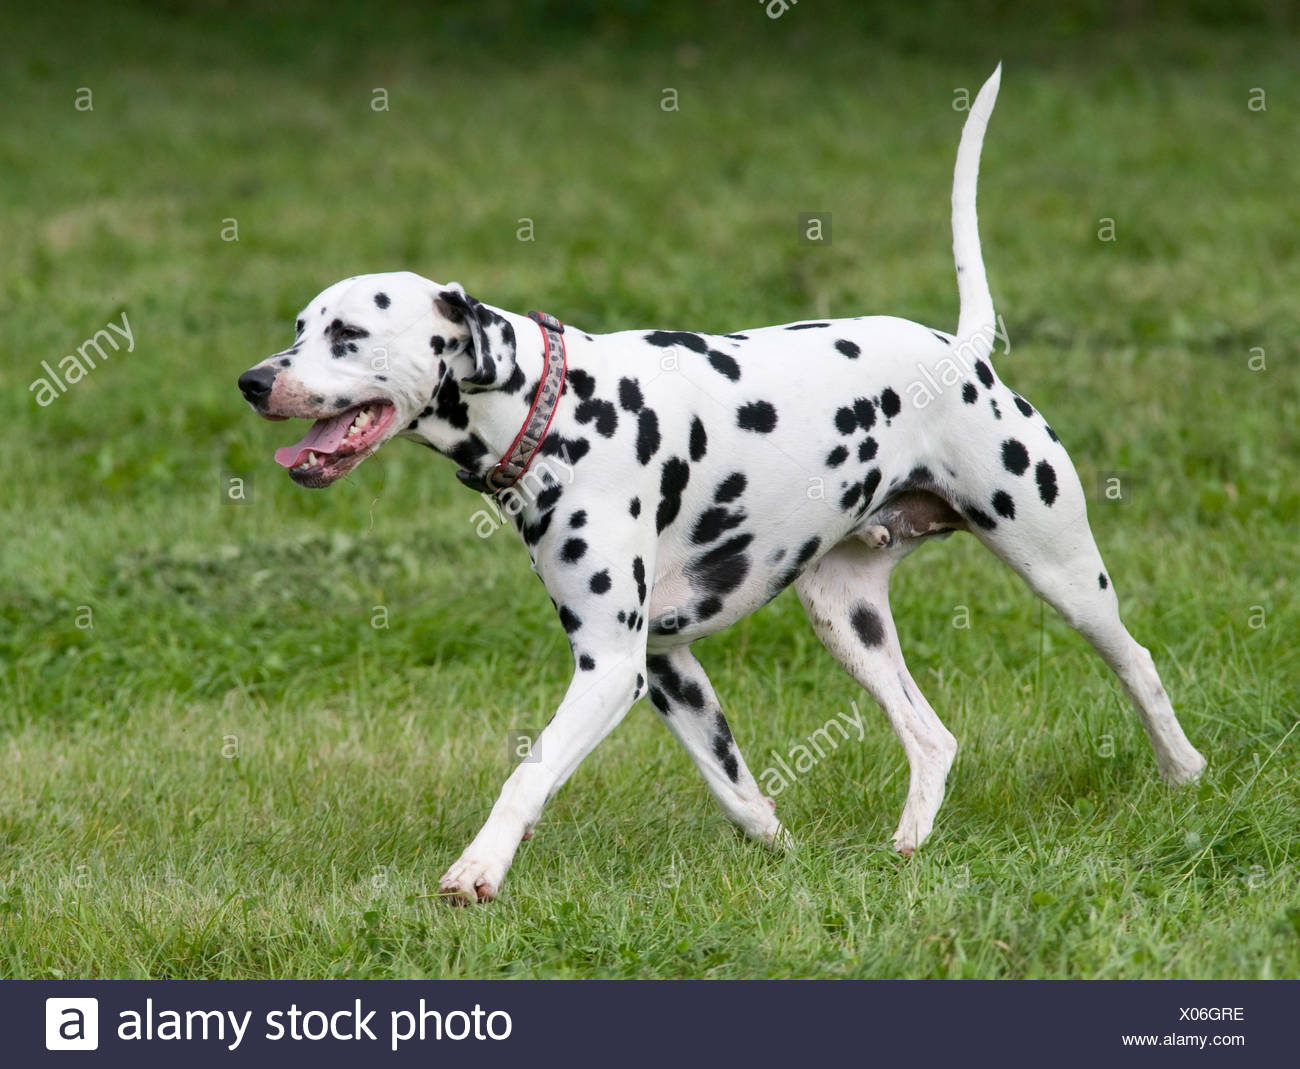 Dalmatian Dog UK in garden Stock Photo